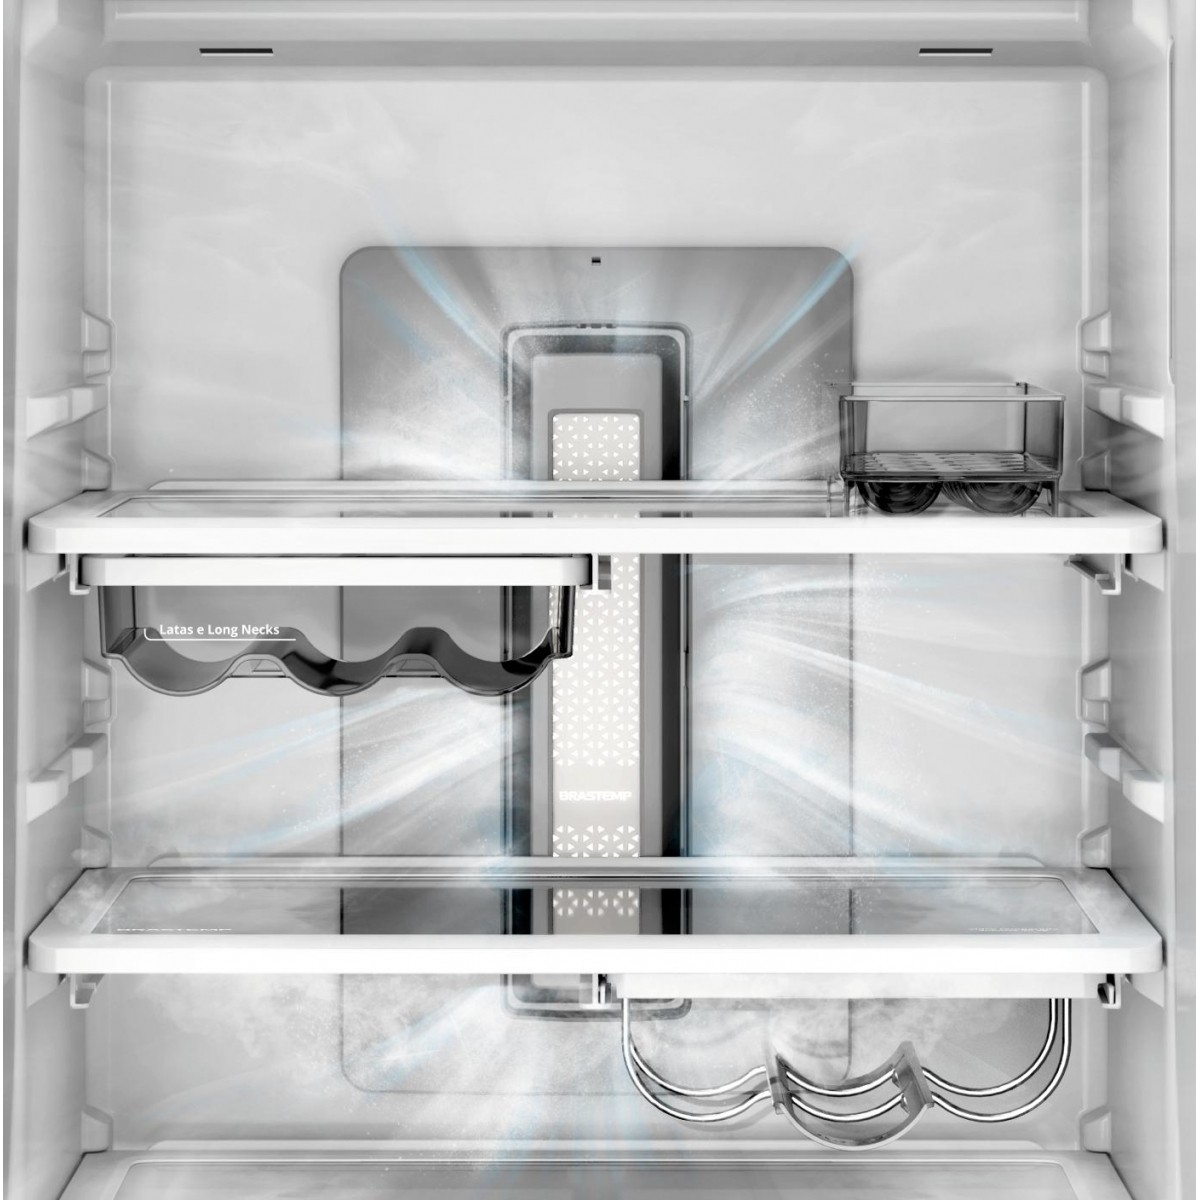 Geladeira Brastemp Inverse Frost Free 460 litros - BRE59AK